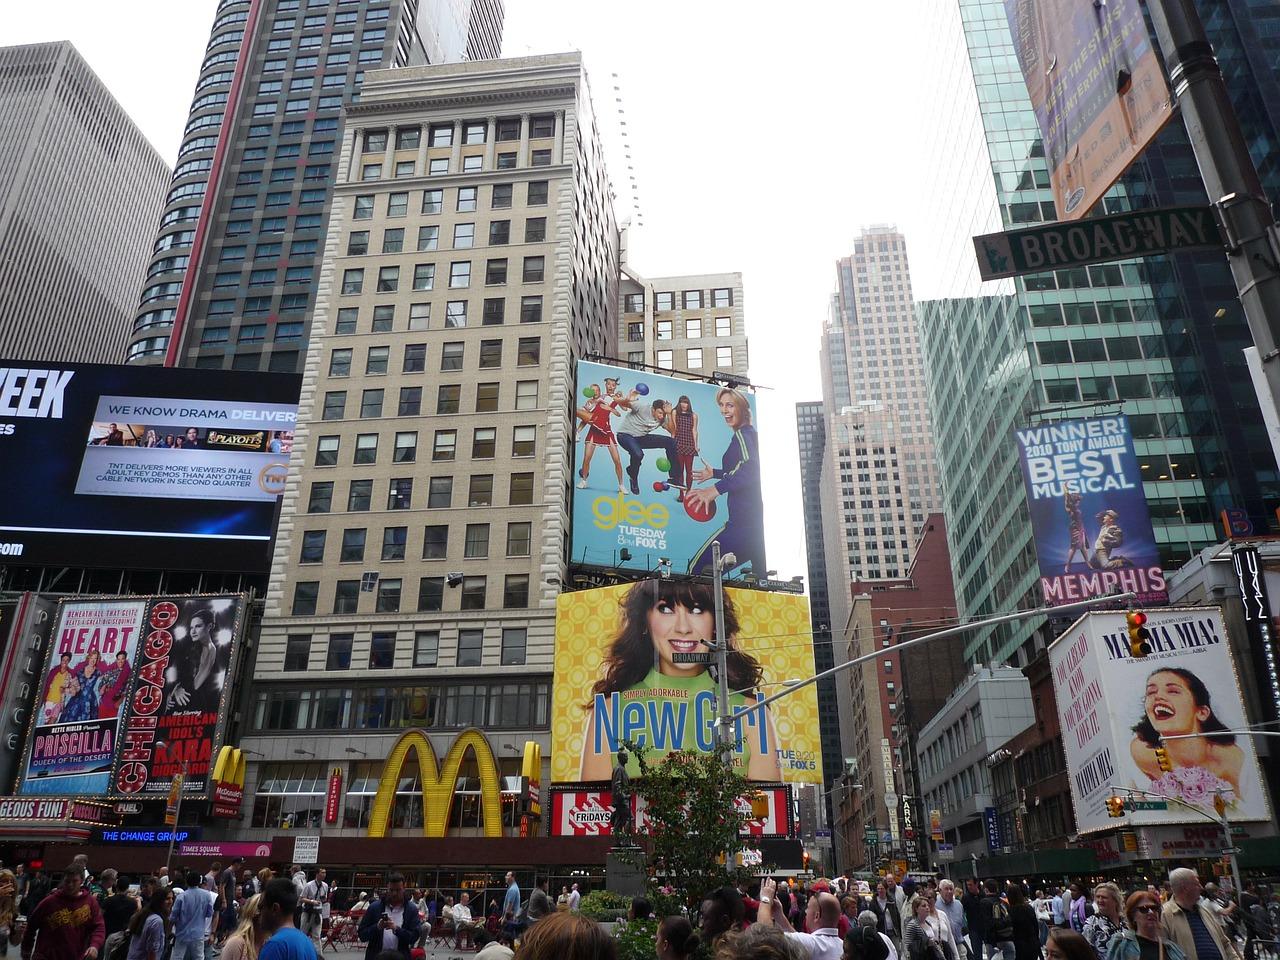 Usa - New York - Broadway